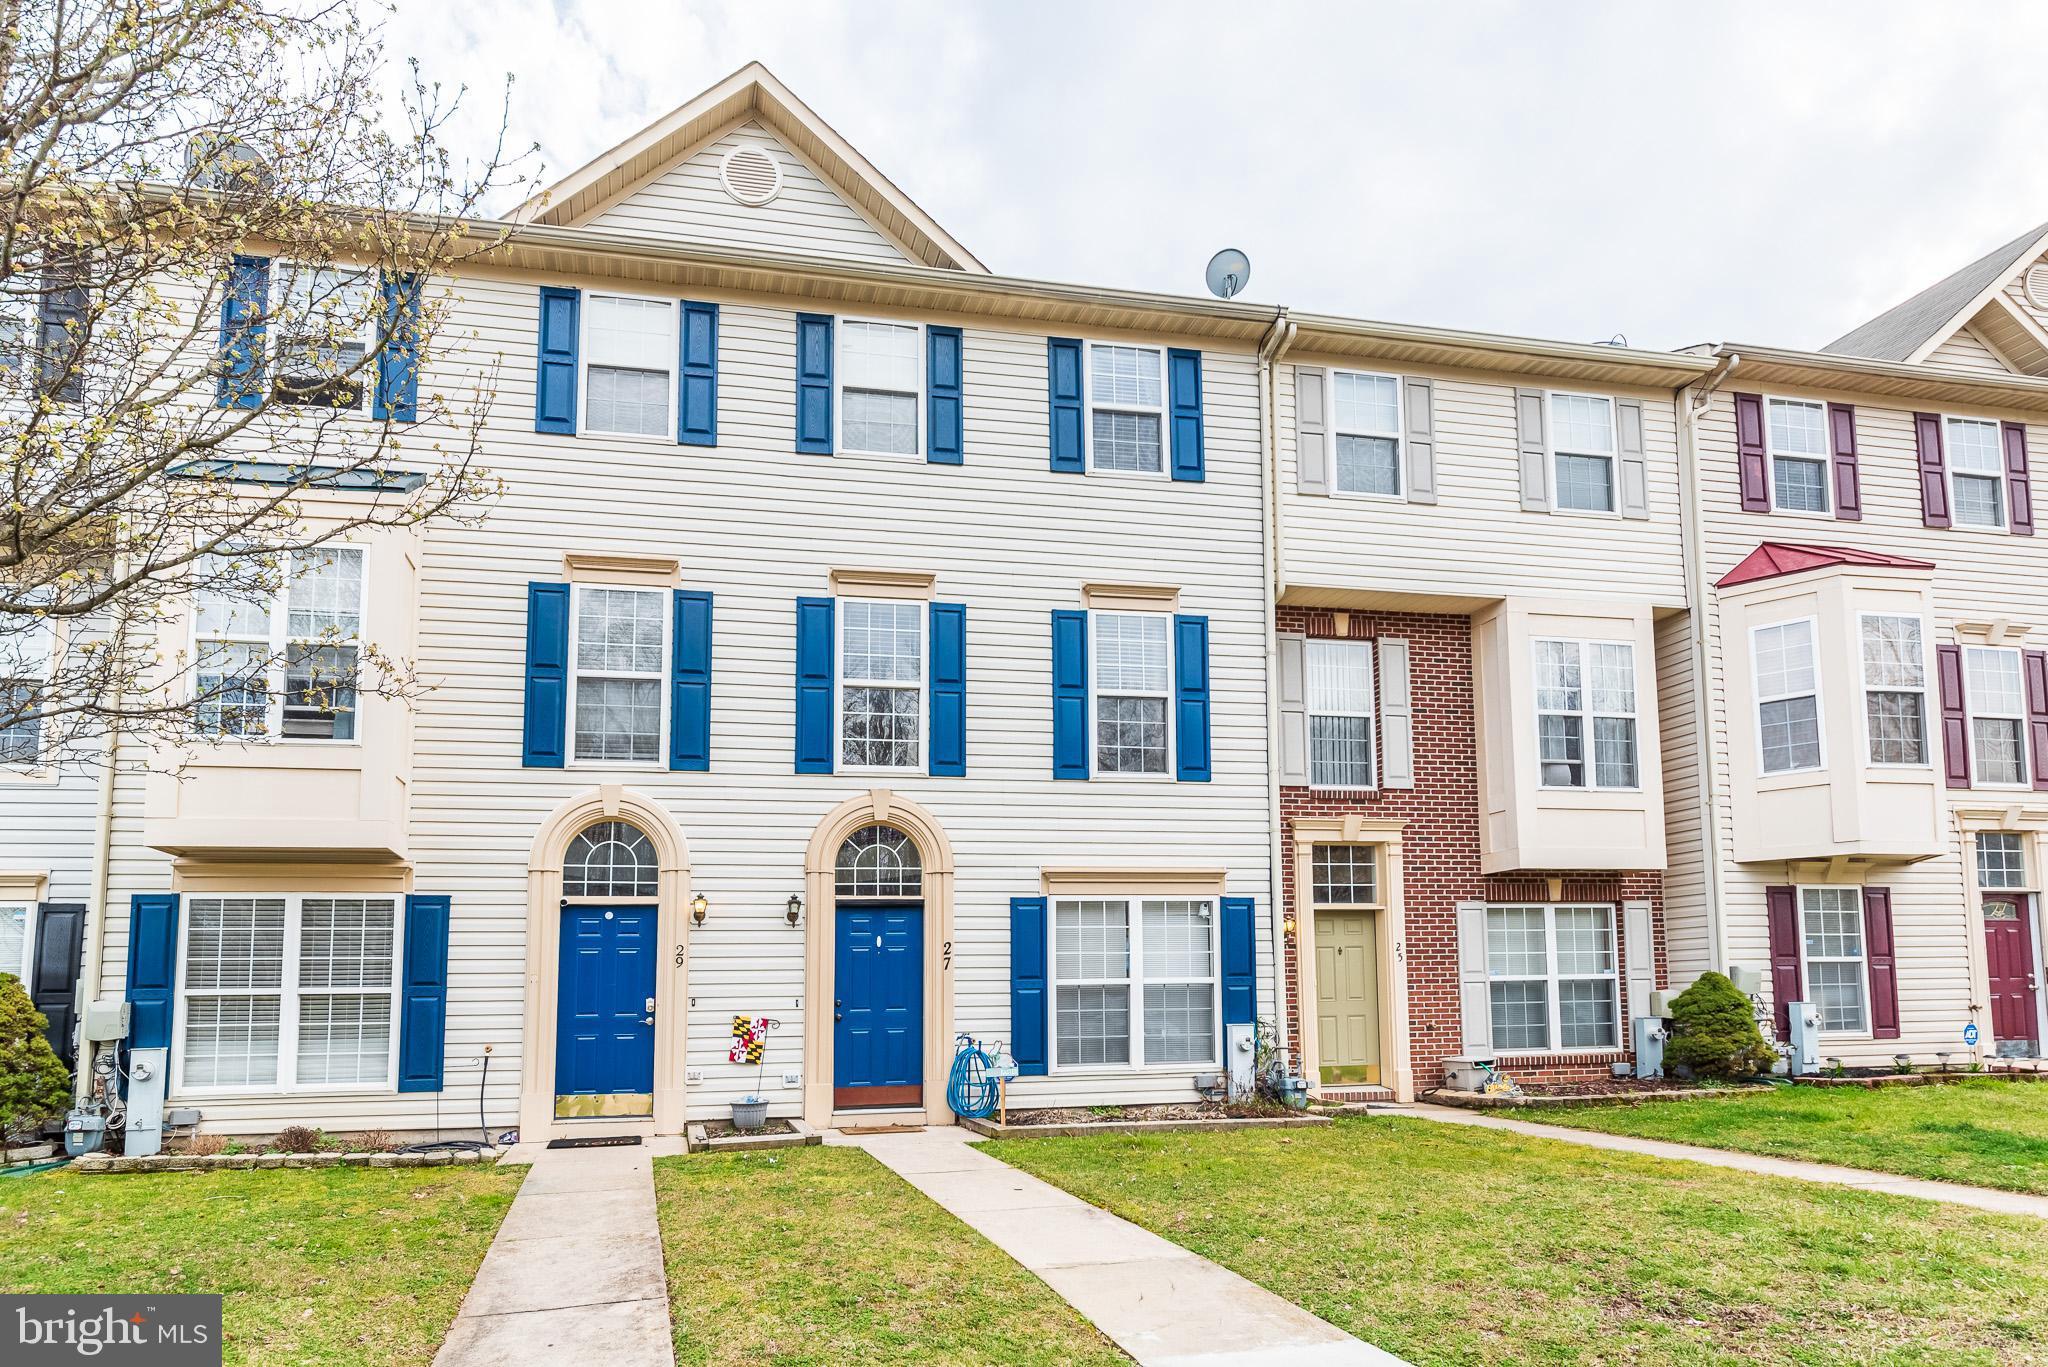 27 Springtide Ct, Baltimore, MD, 21220